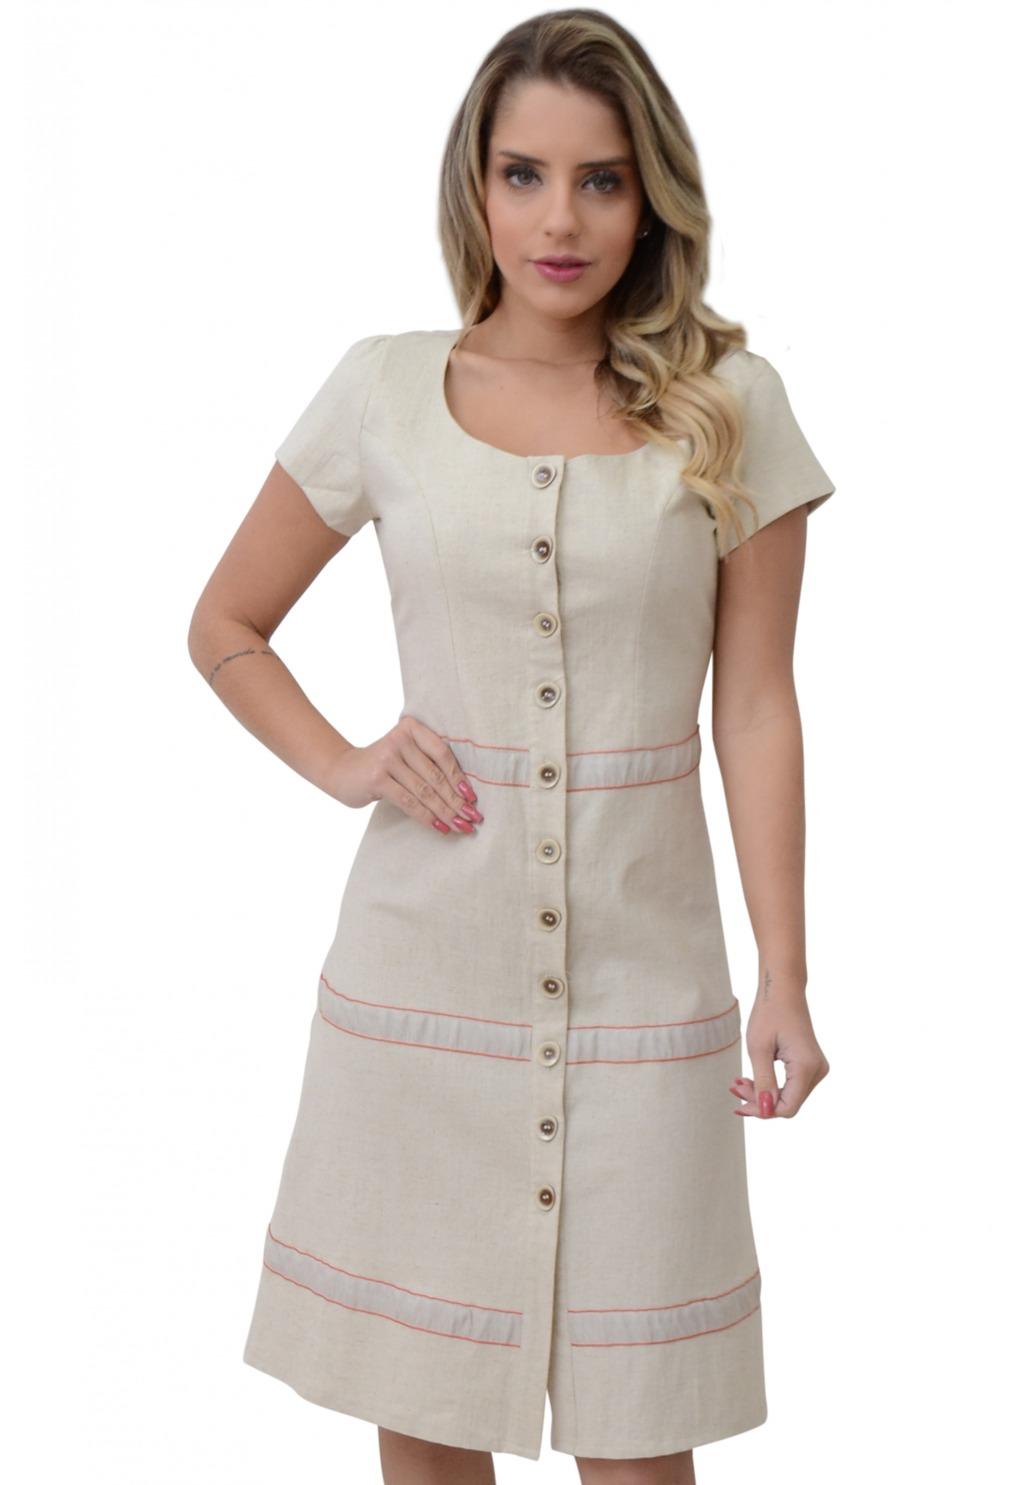 Vestido Mamorena linho manga curta recorte fita